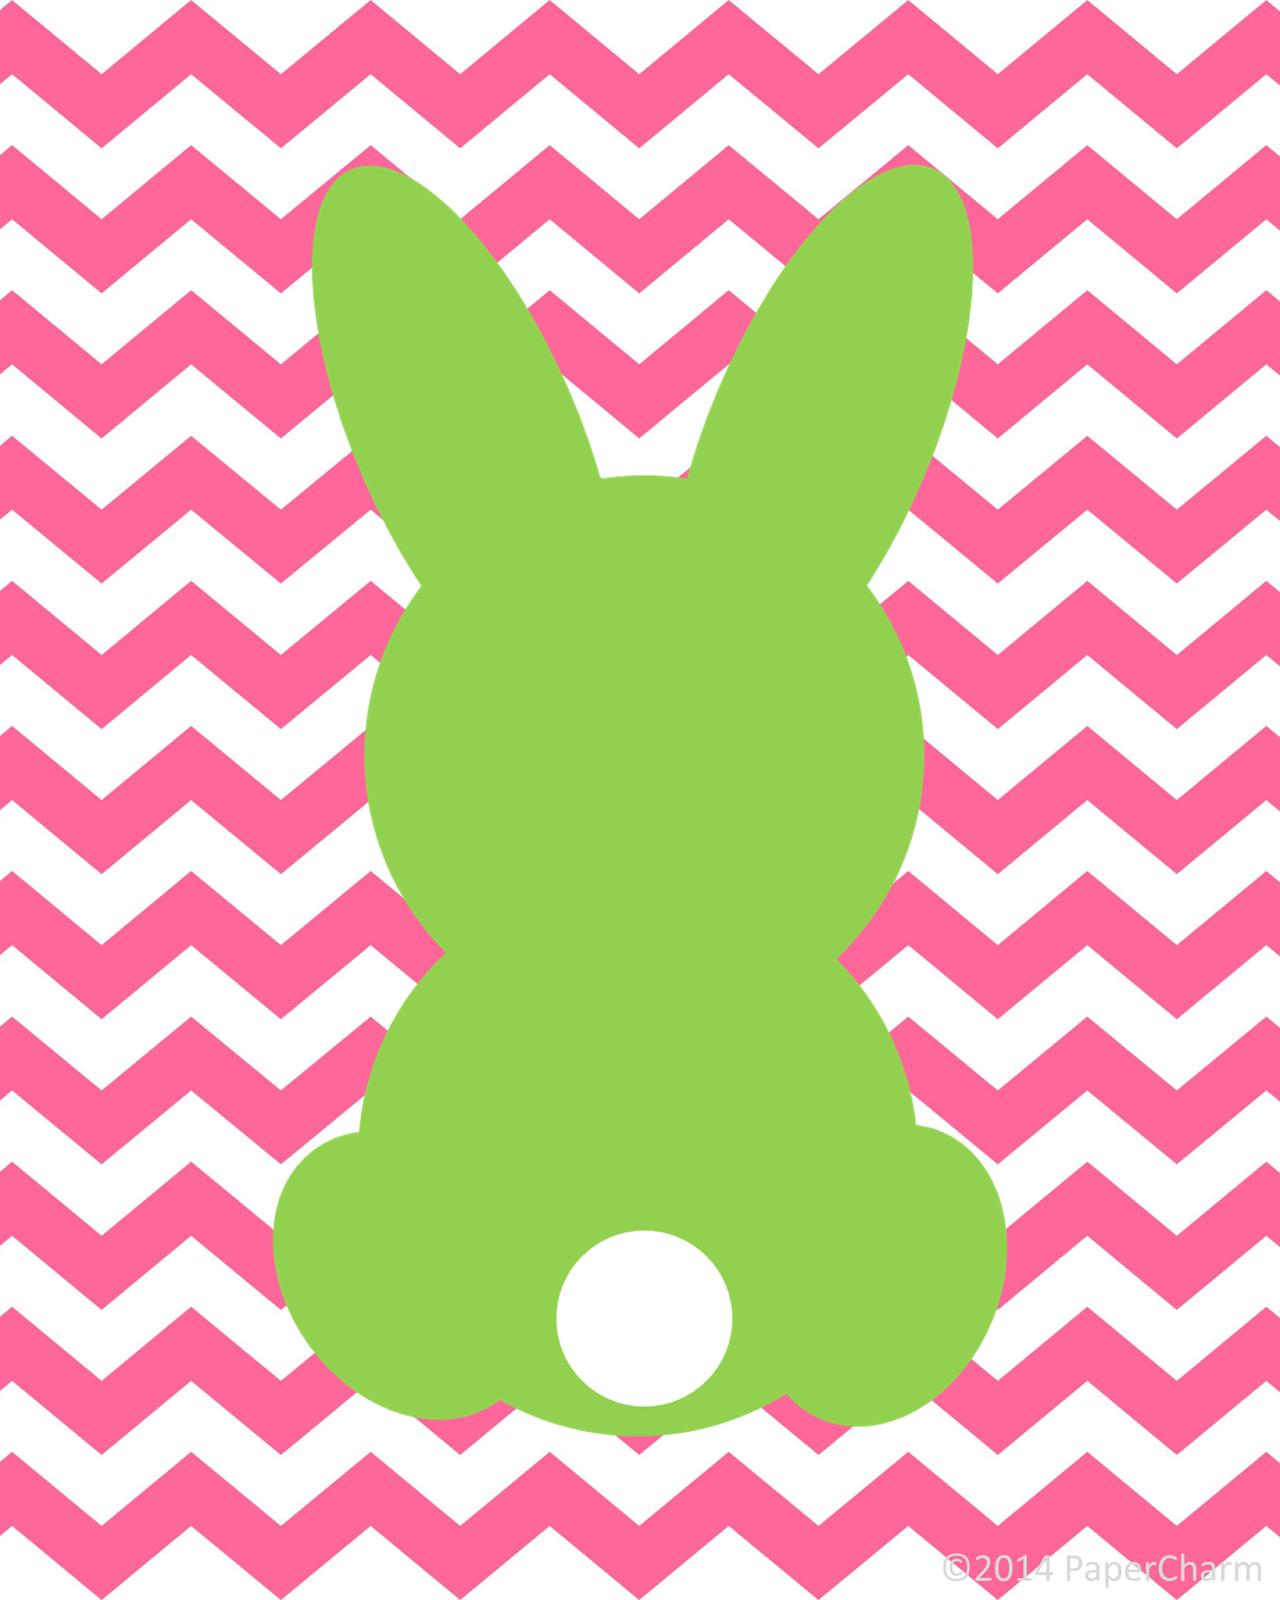 Free Bunny Printable Easter Art Fun And Colorful Printable For Easter